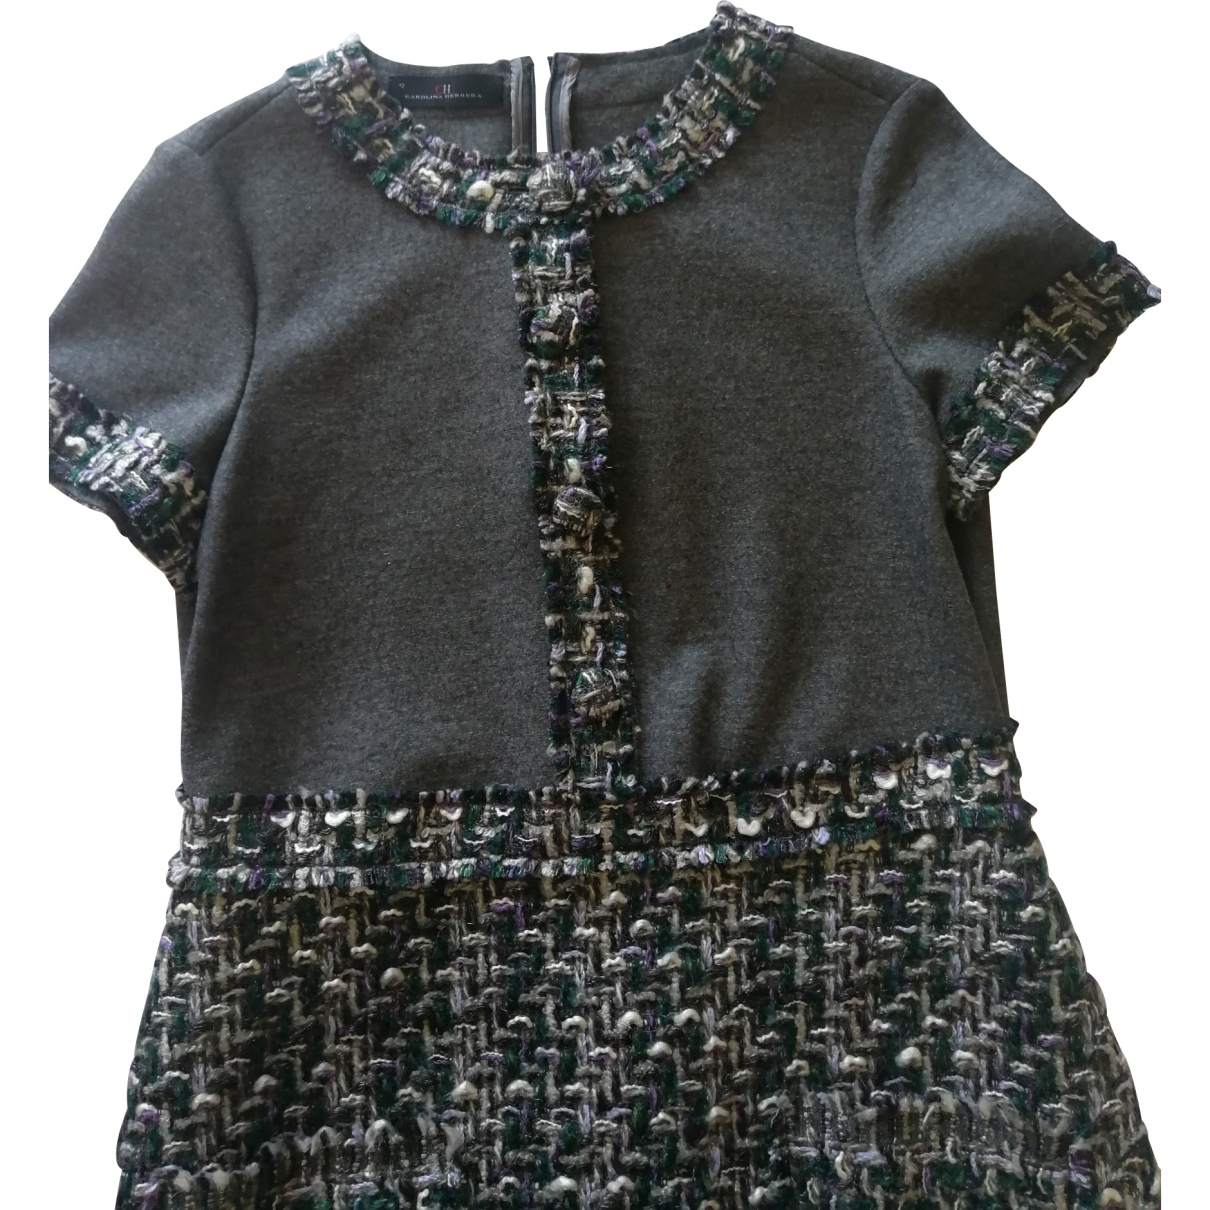 Carolina Herrera \N Grey Wool dress for Women 12 US